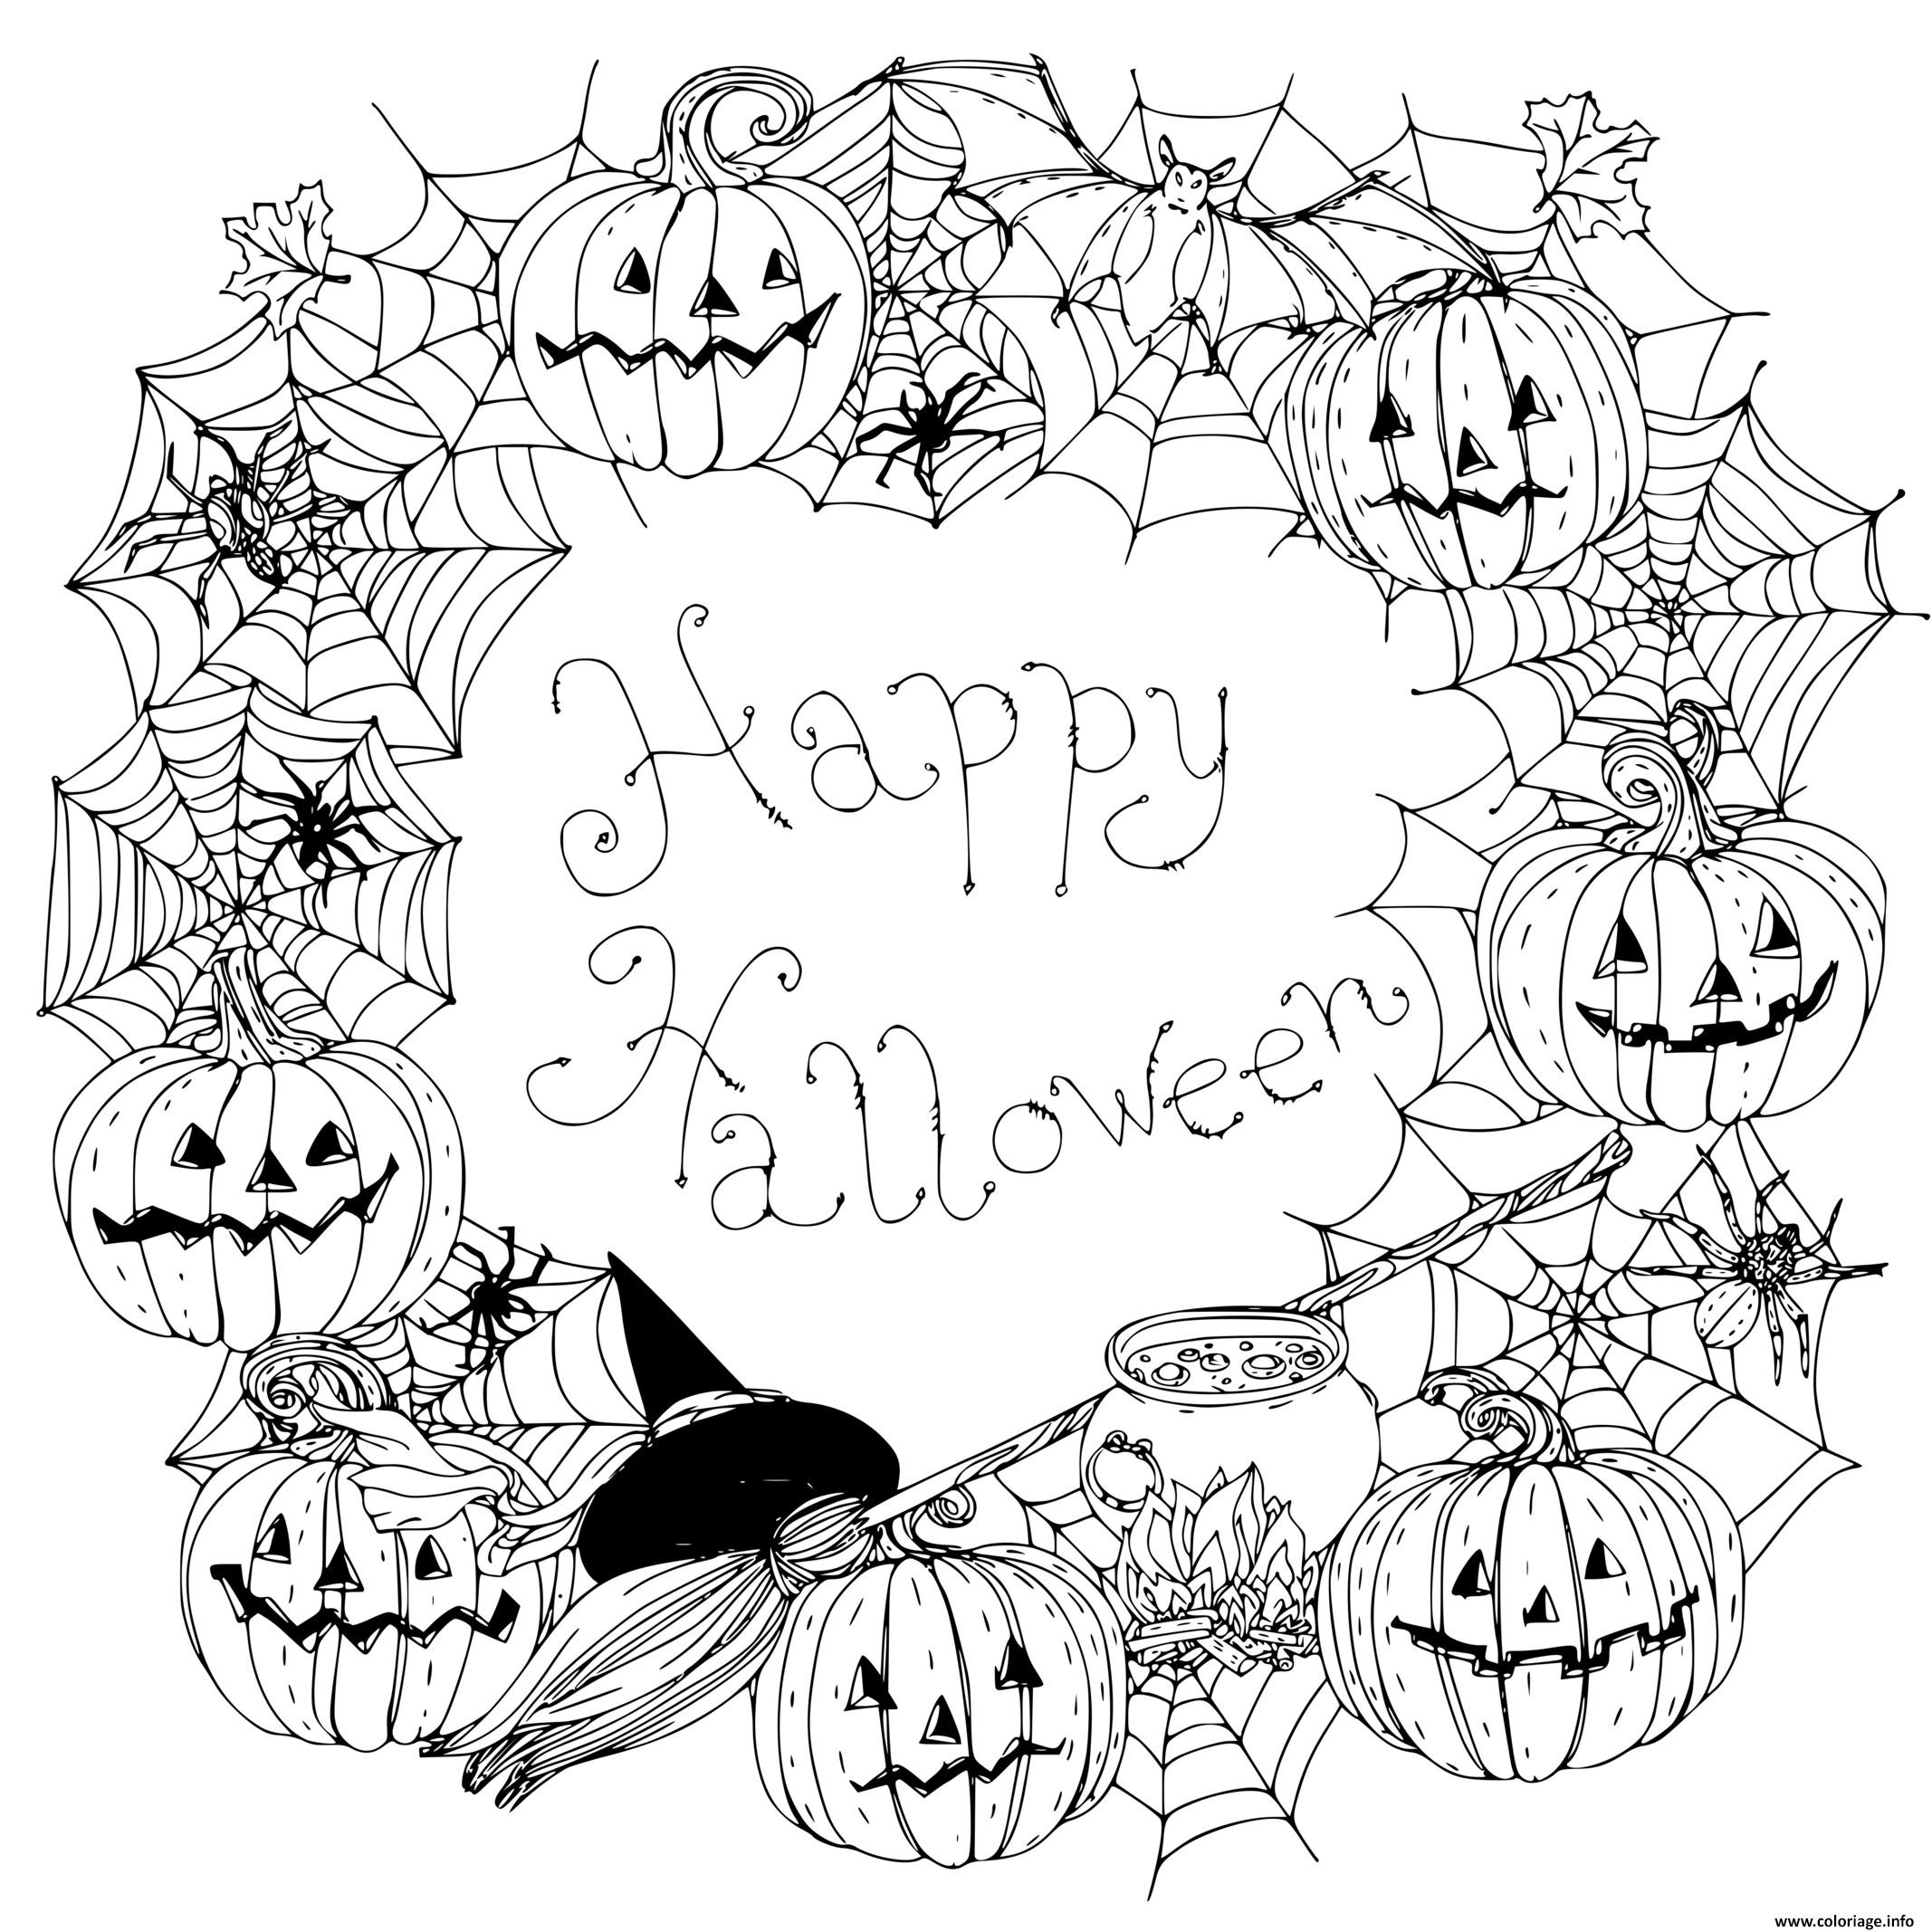 Dessin joyeuse halloween mandala Coloriage Gratuit à Imprimer